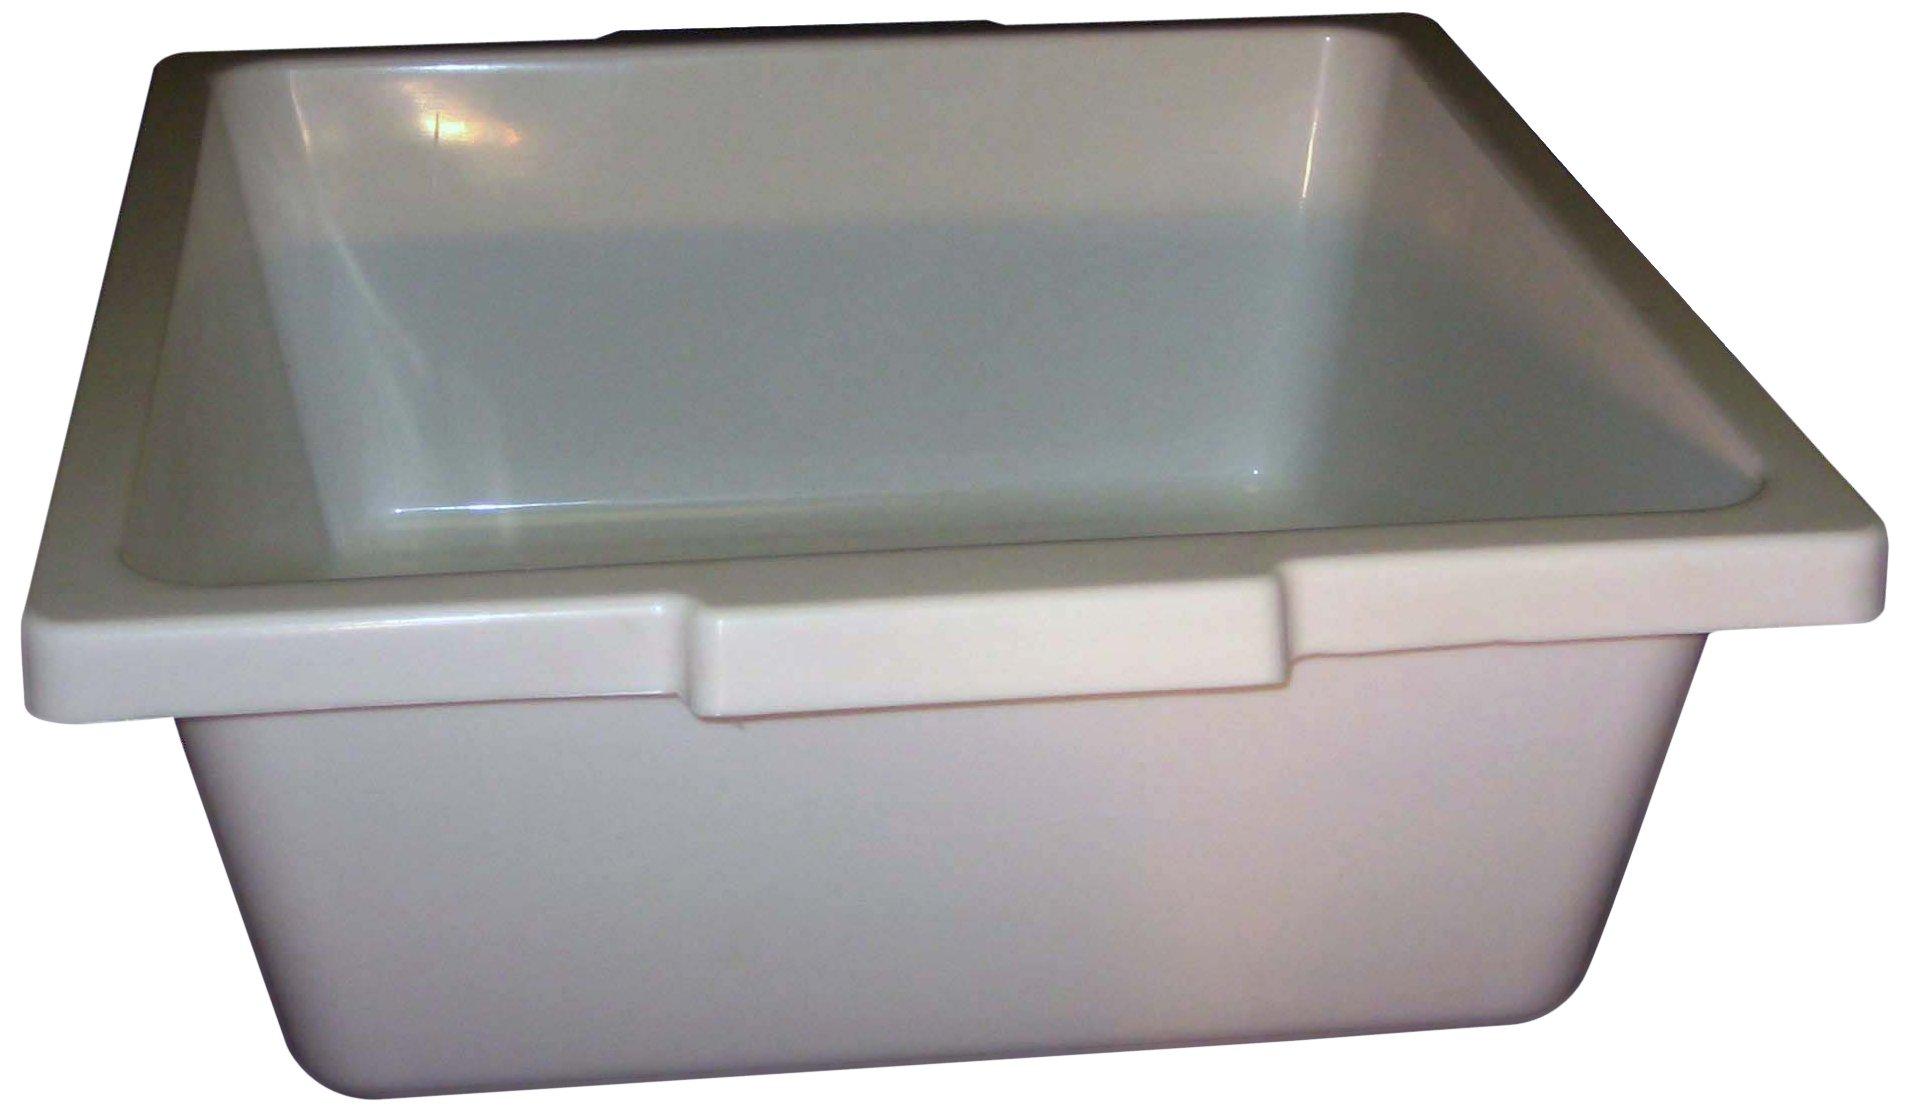 PSC 1007178 General Purpose Trays, Autoclavable, Polypropylene, 15'' x 14'' x 5'', White